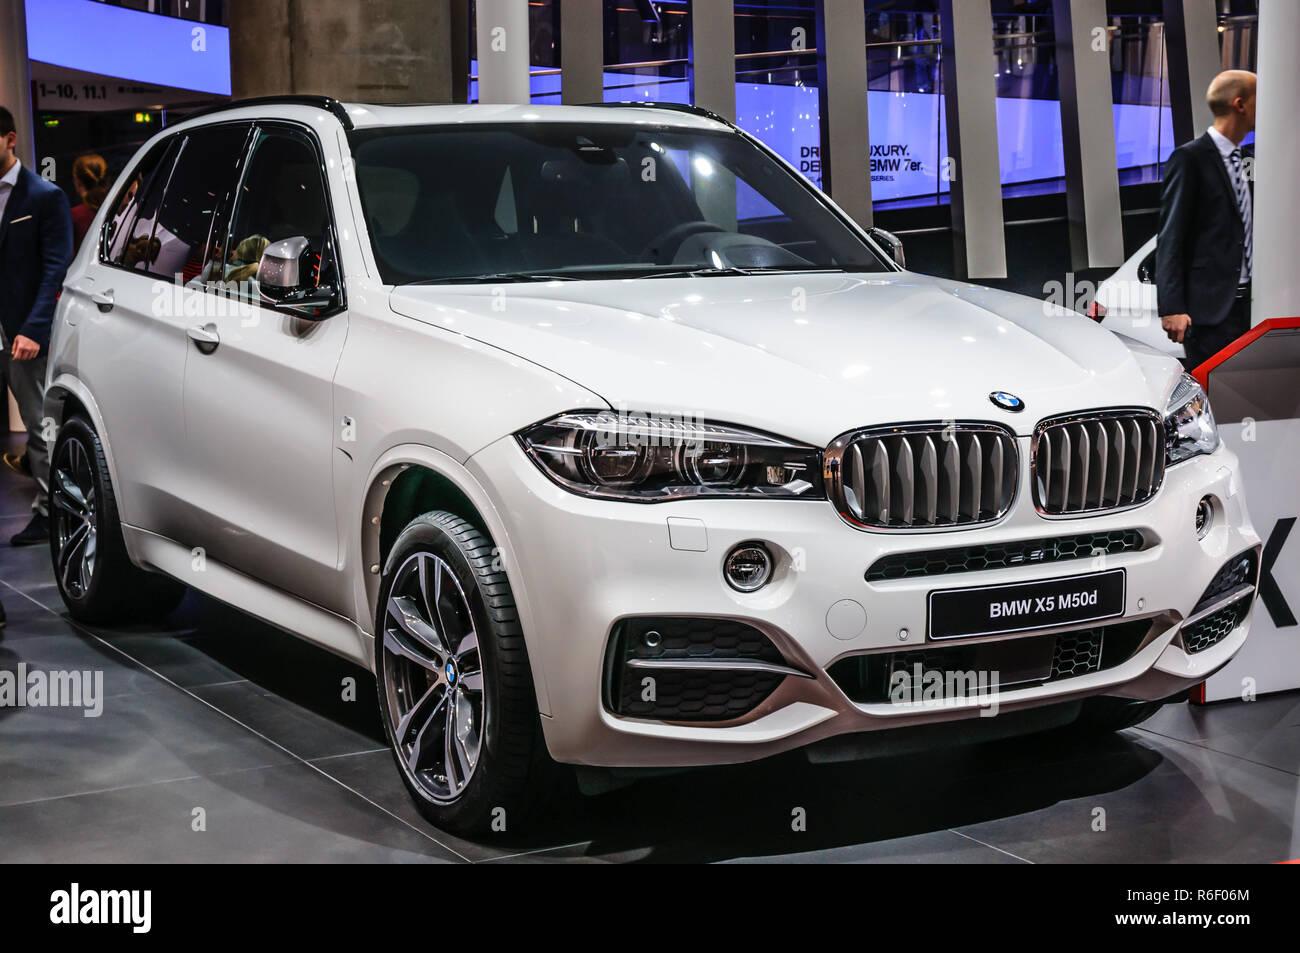 FRANKFURT - SEPT 2015: BMW X5 M50d presented at IAA International Motor Show on September 20, 2015 in Frankfurt, Germany - Stock Image